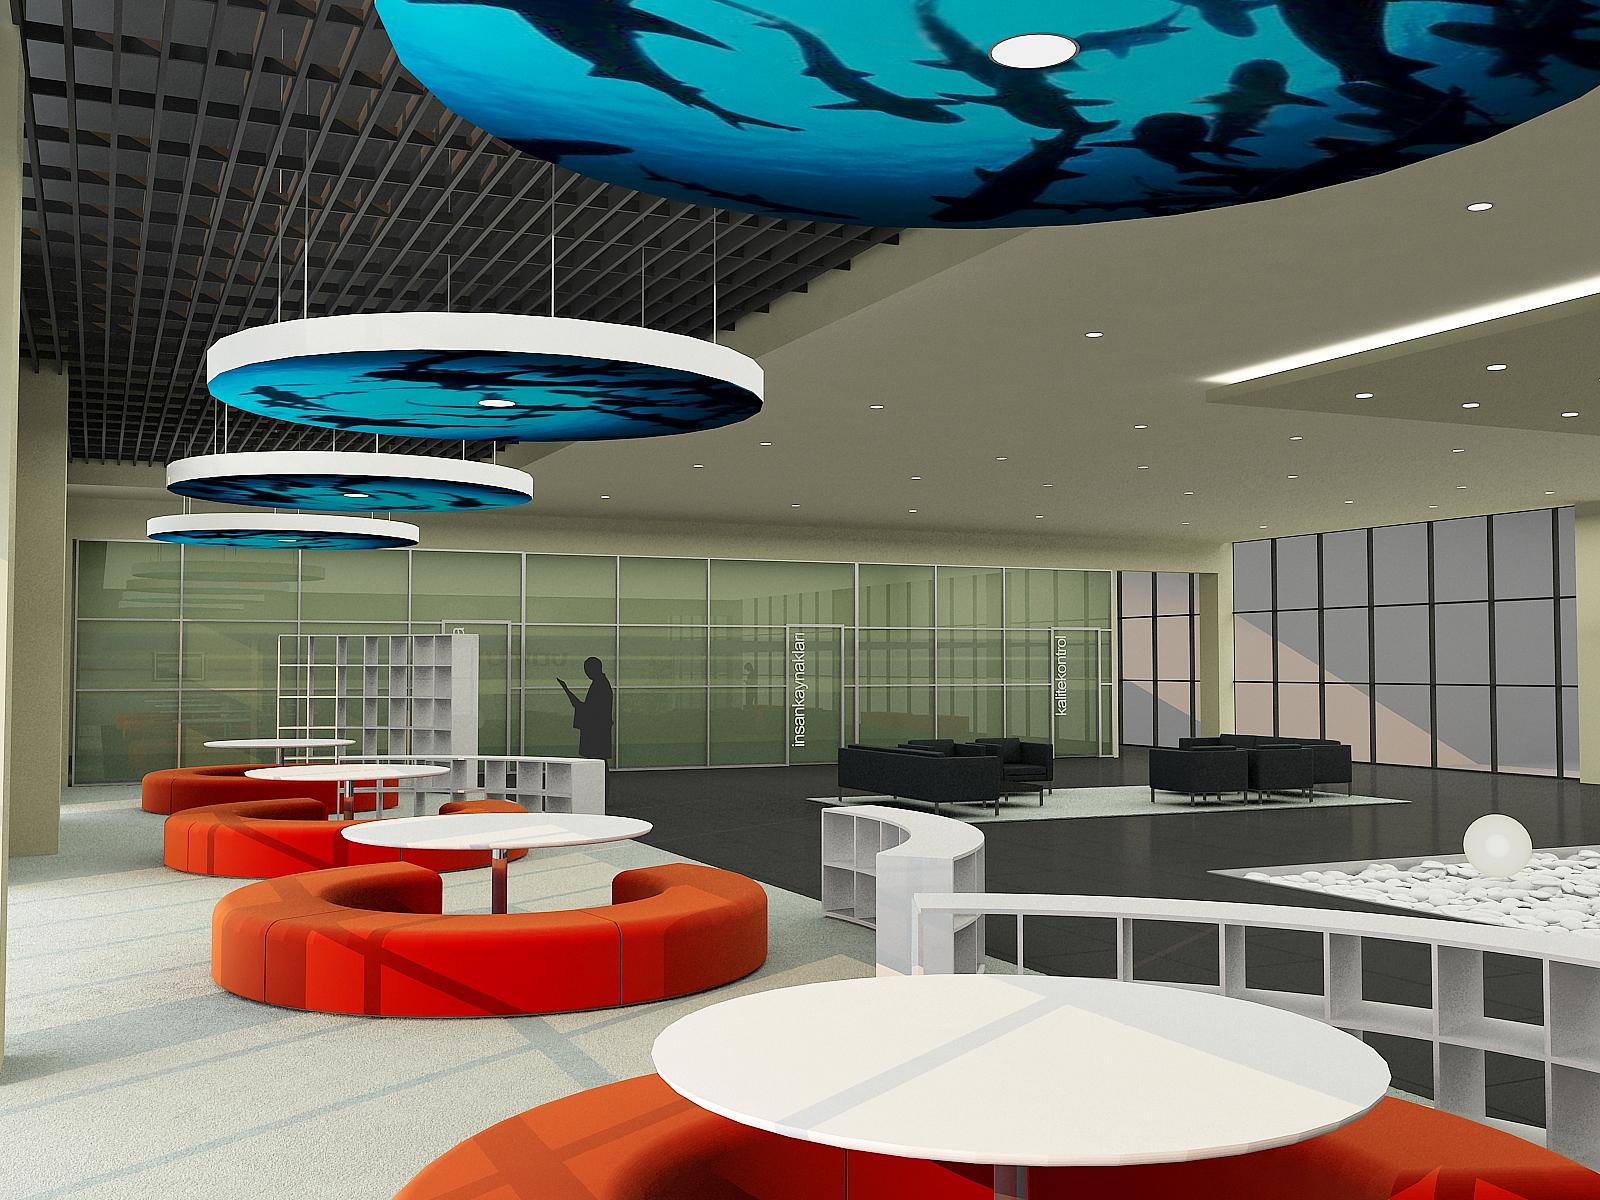 Interior design by ece yalim oguz yalim at coroflotcom for Office lounge design